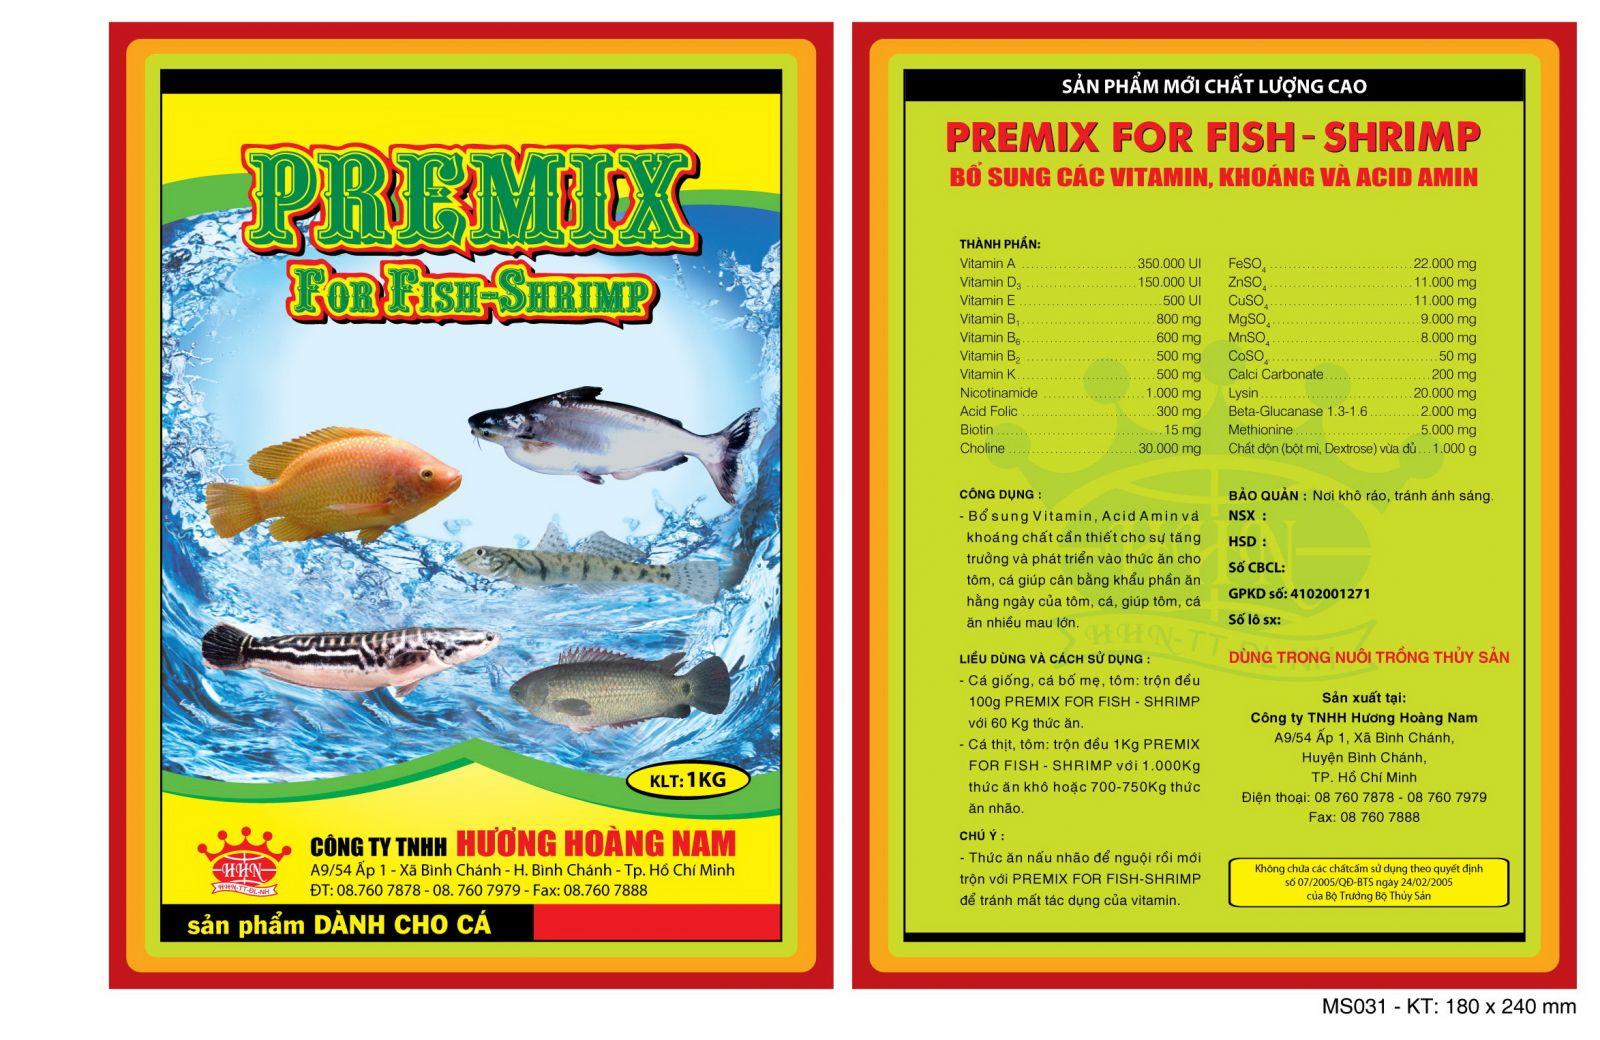 Dinh dưỡng thủy sản Premix for fish - shrimp